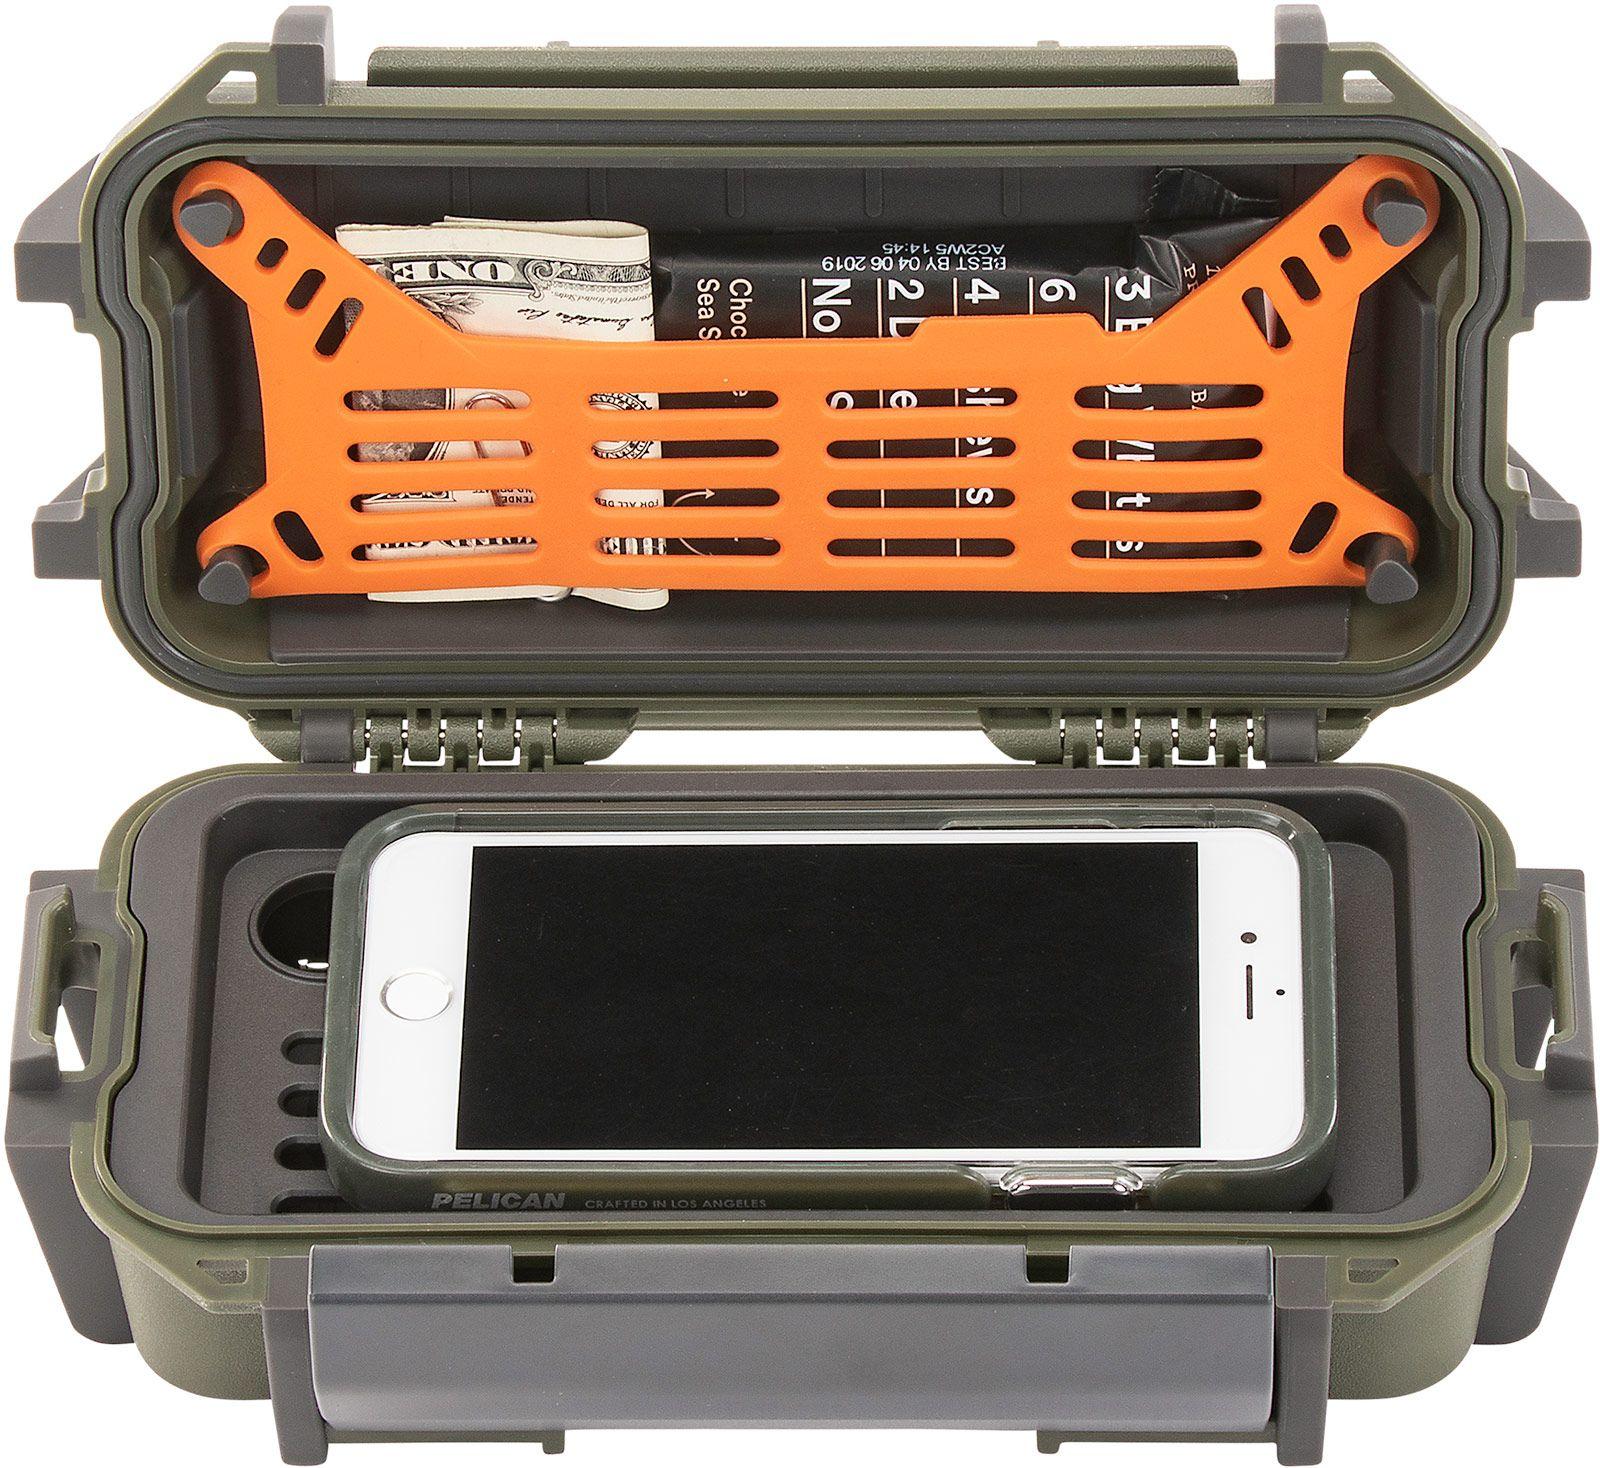 R20 Personal Utility Ruck Case Pelican Ruck Waterproof Storage Pelican Case